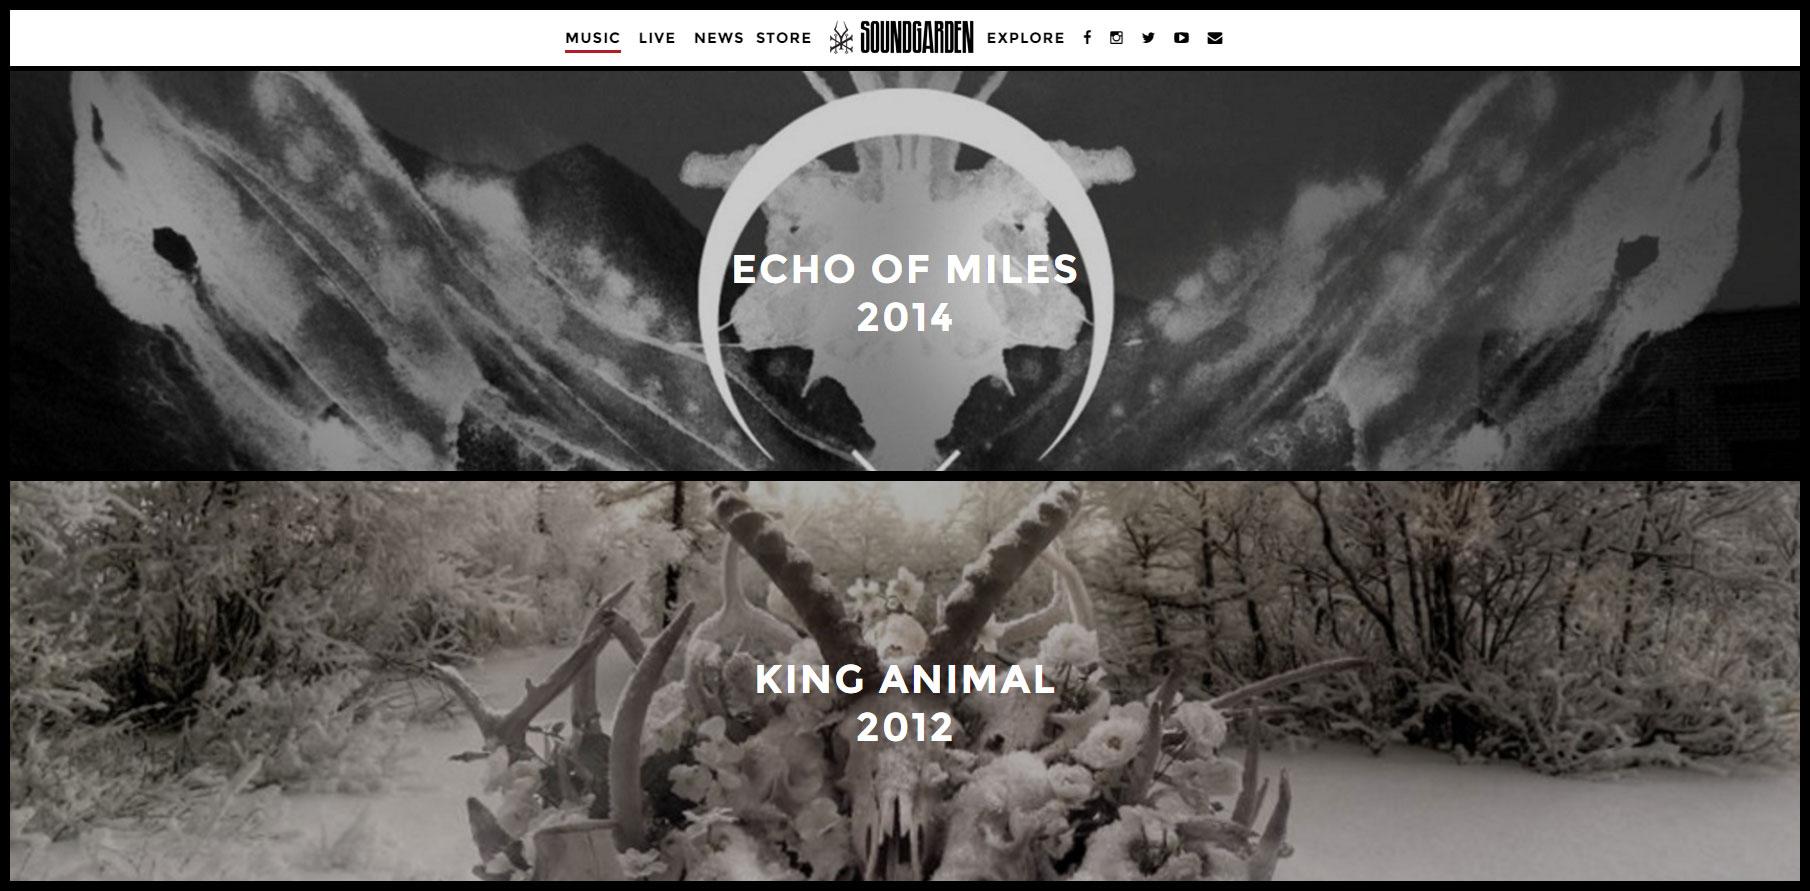 Soundgarden Official Website - Website of the Day